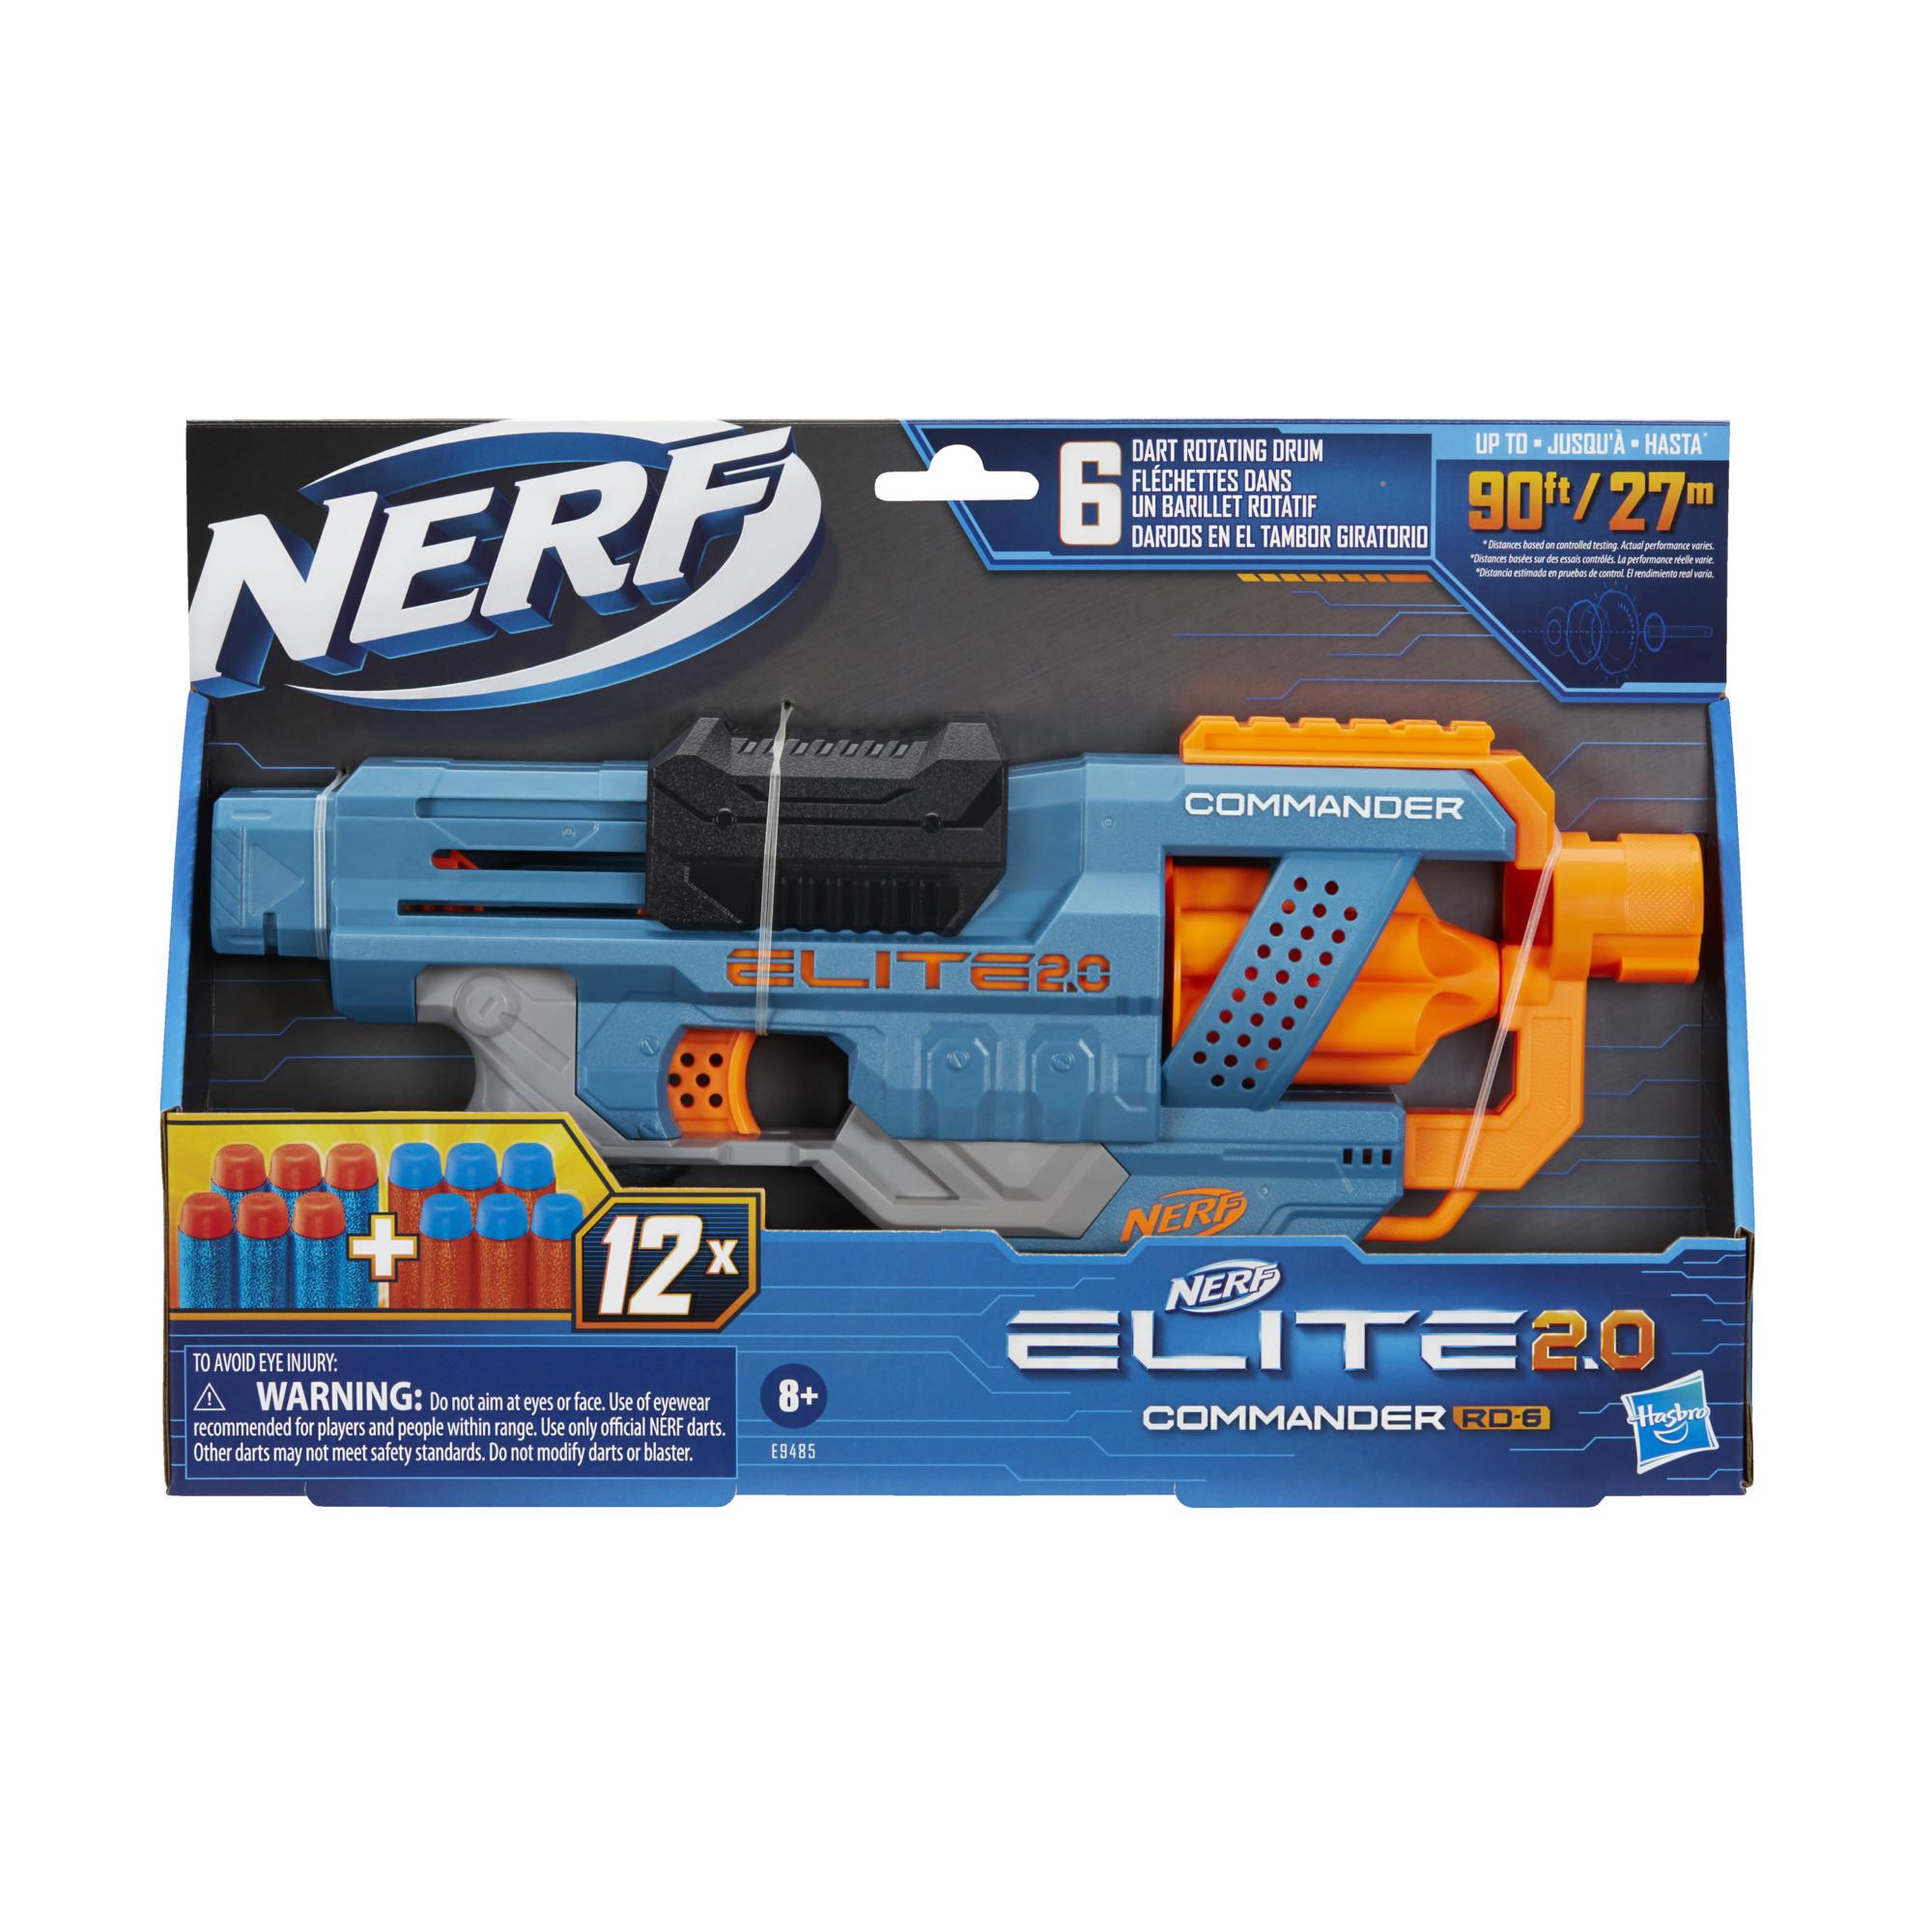 Nerf Elite 2.0 Commander RD-6 Blaster, 12 Official Nerf Darts, 6-Dart Rotating Drum, Built-In Customizing Capabilities